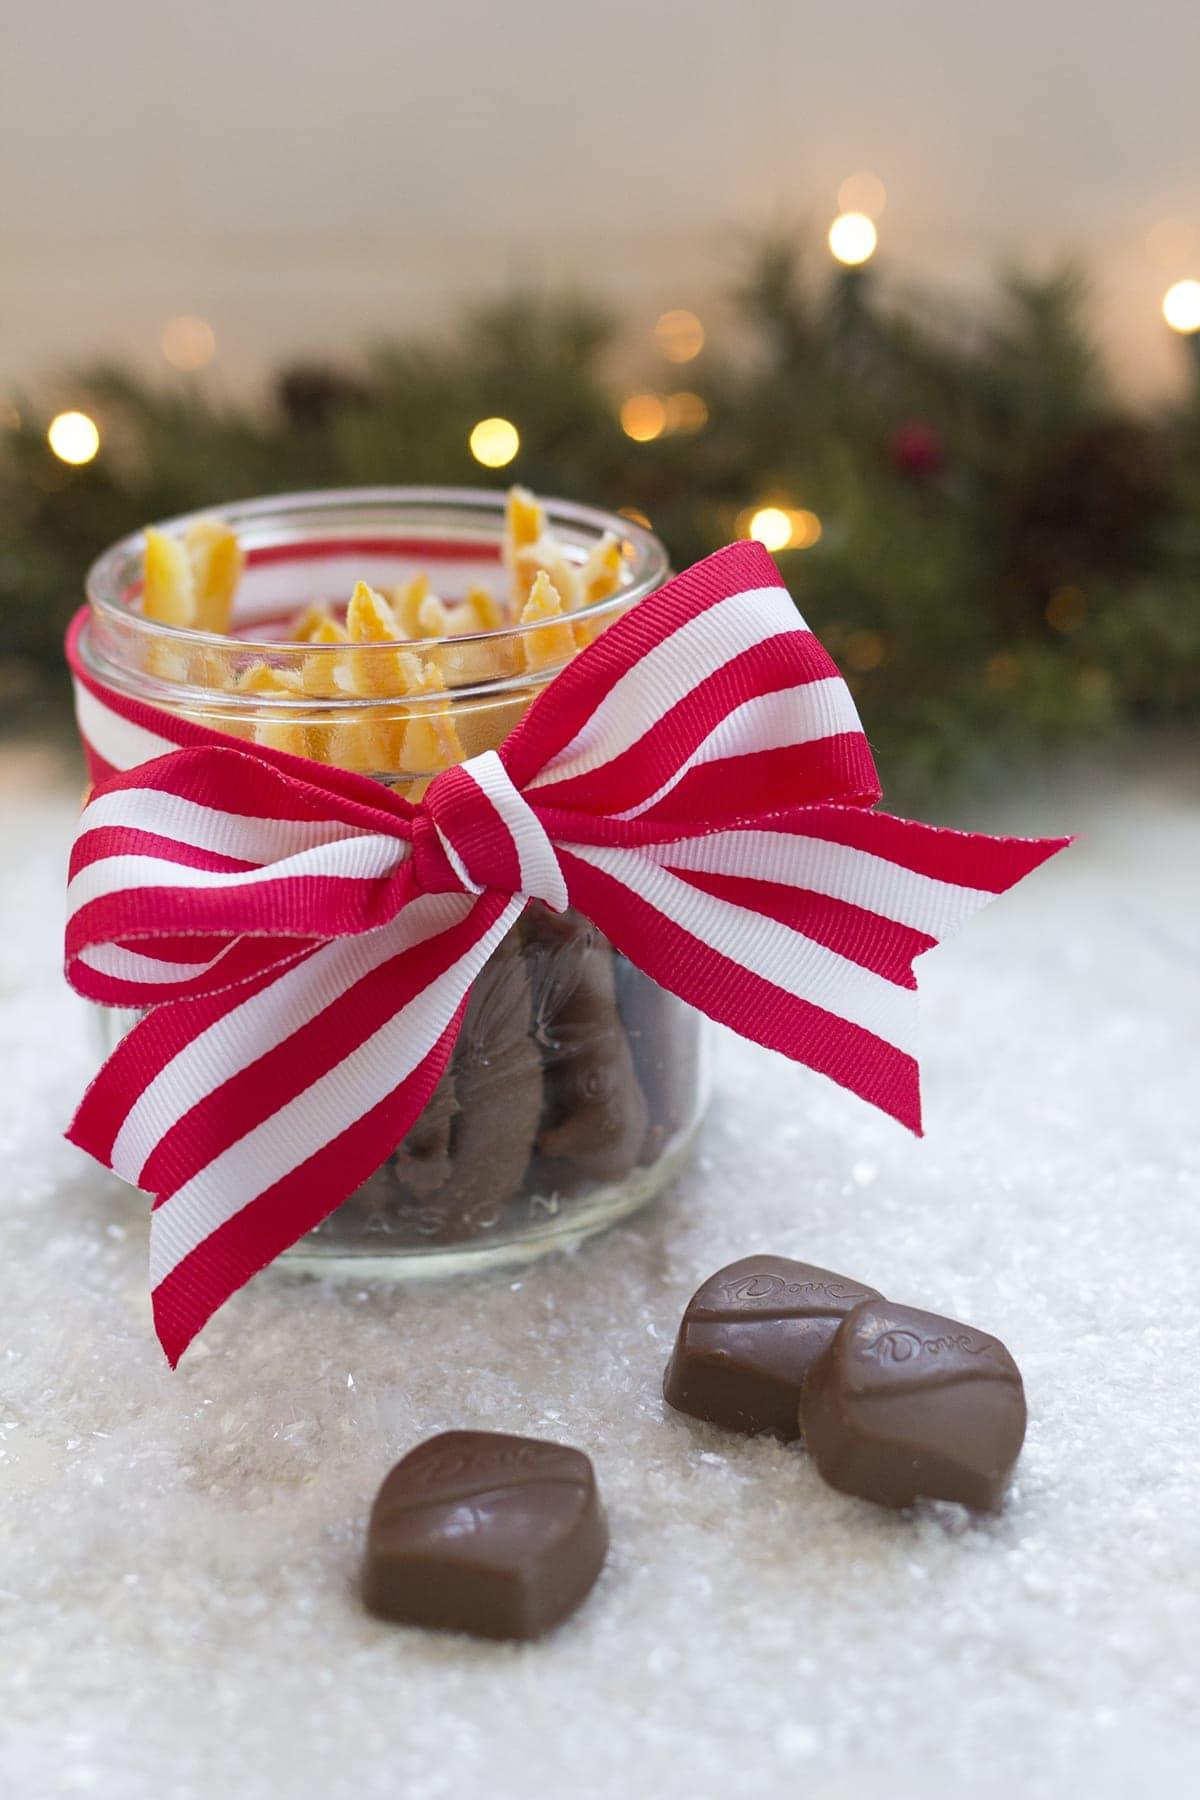 Chocolate Dipped Candied Orange Peels